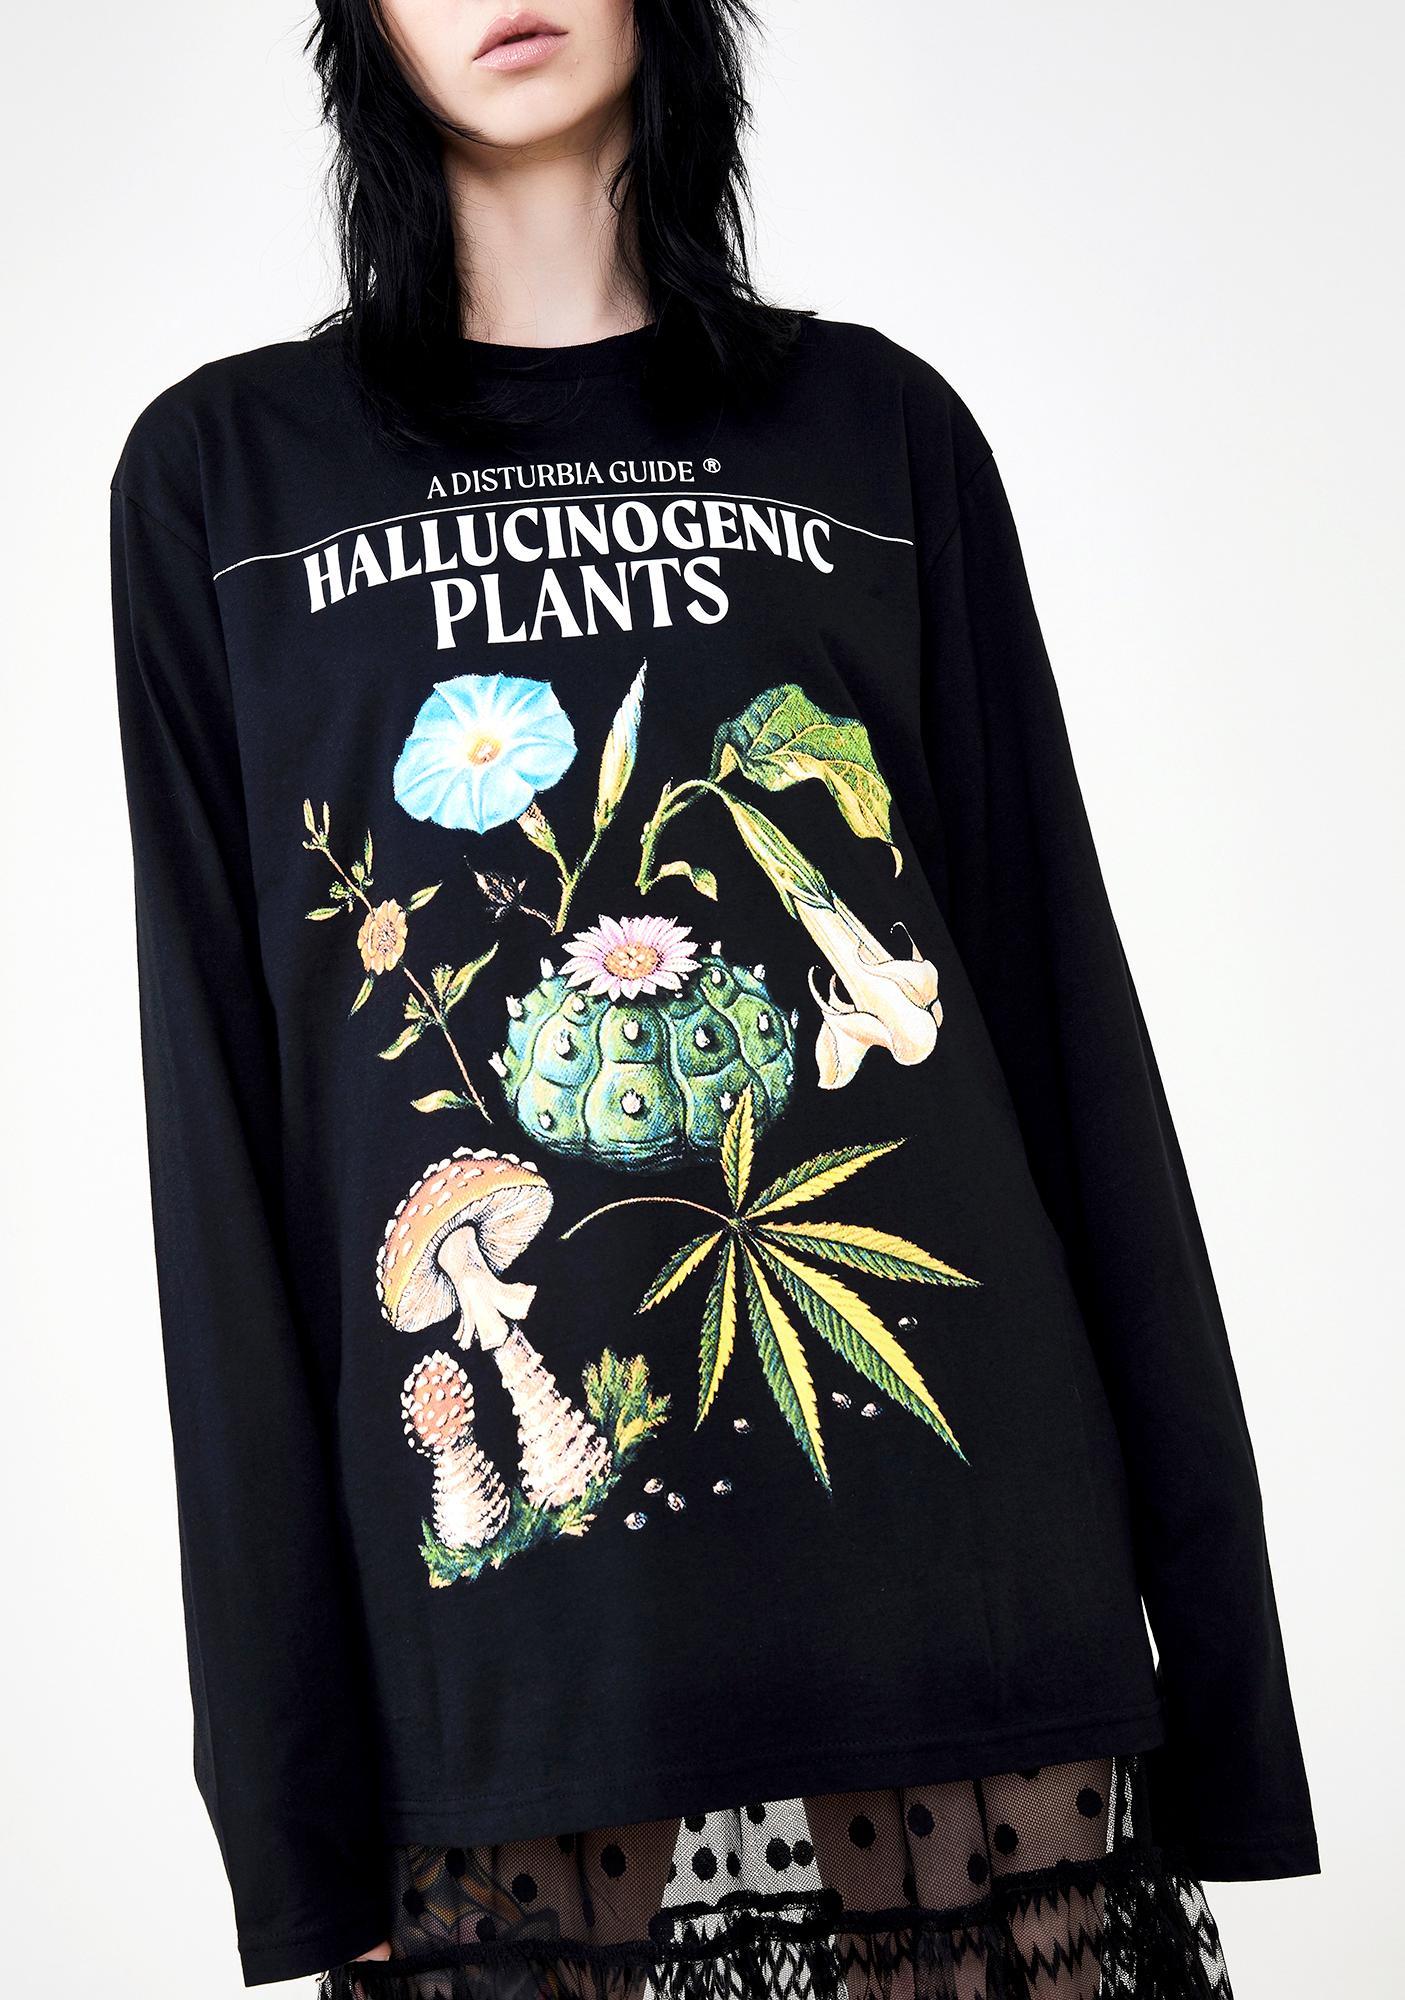 Disturbia Plants Graphic Tee